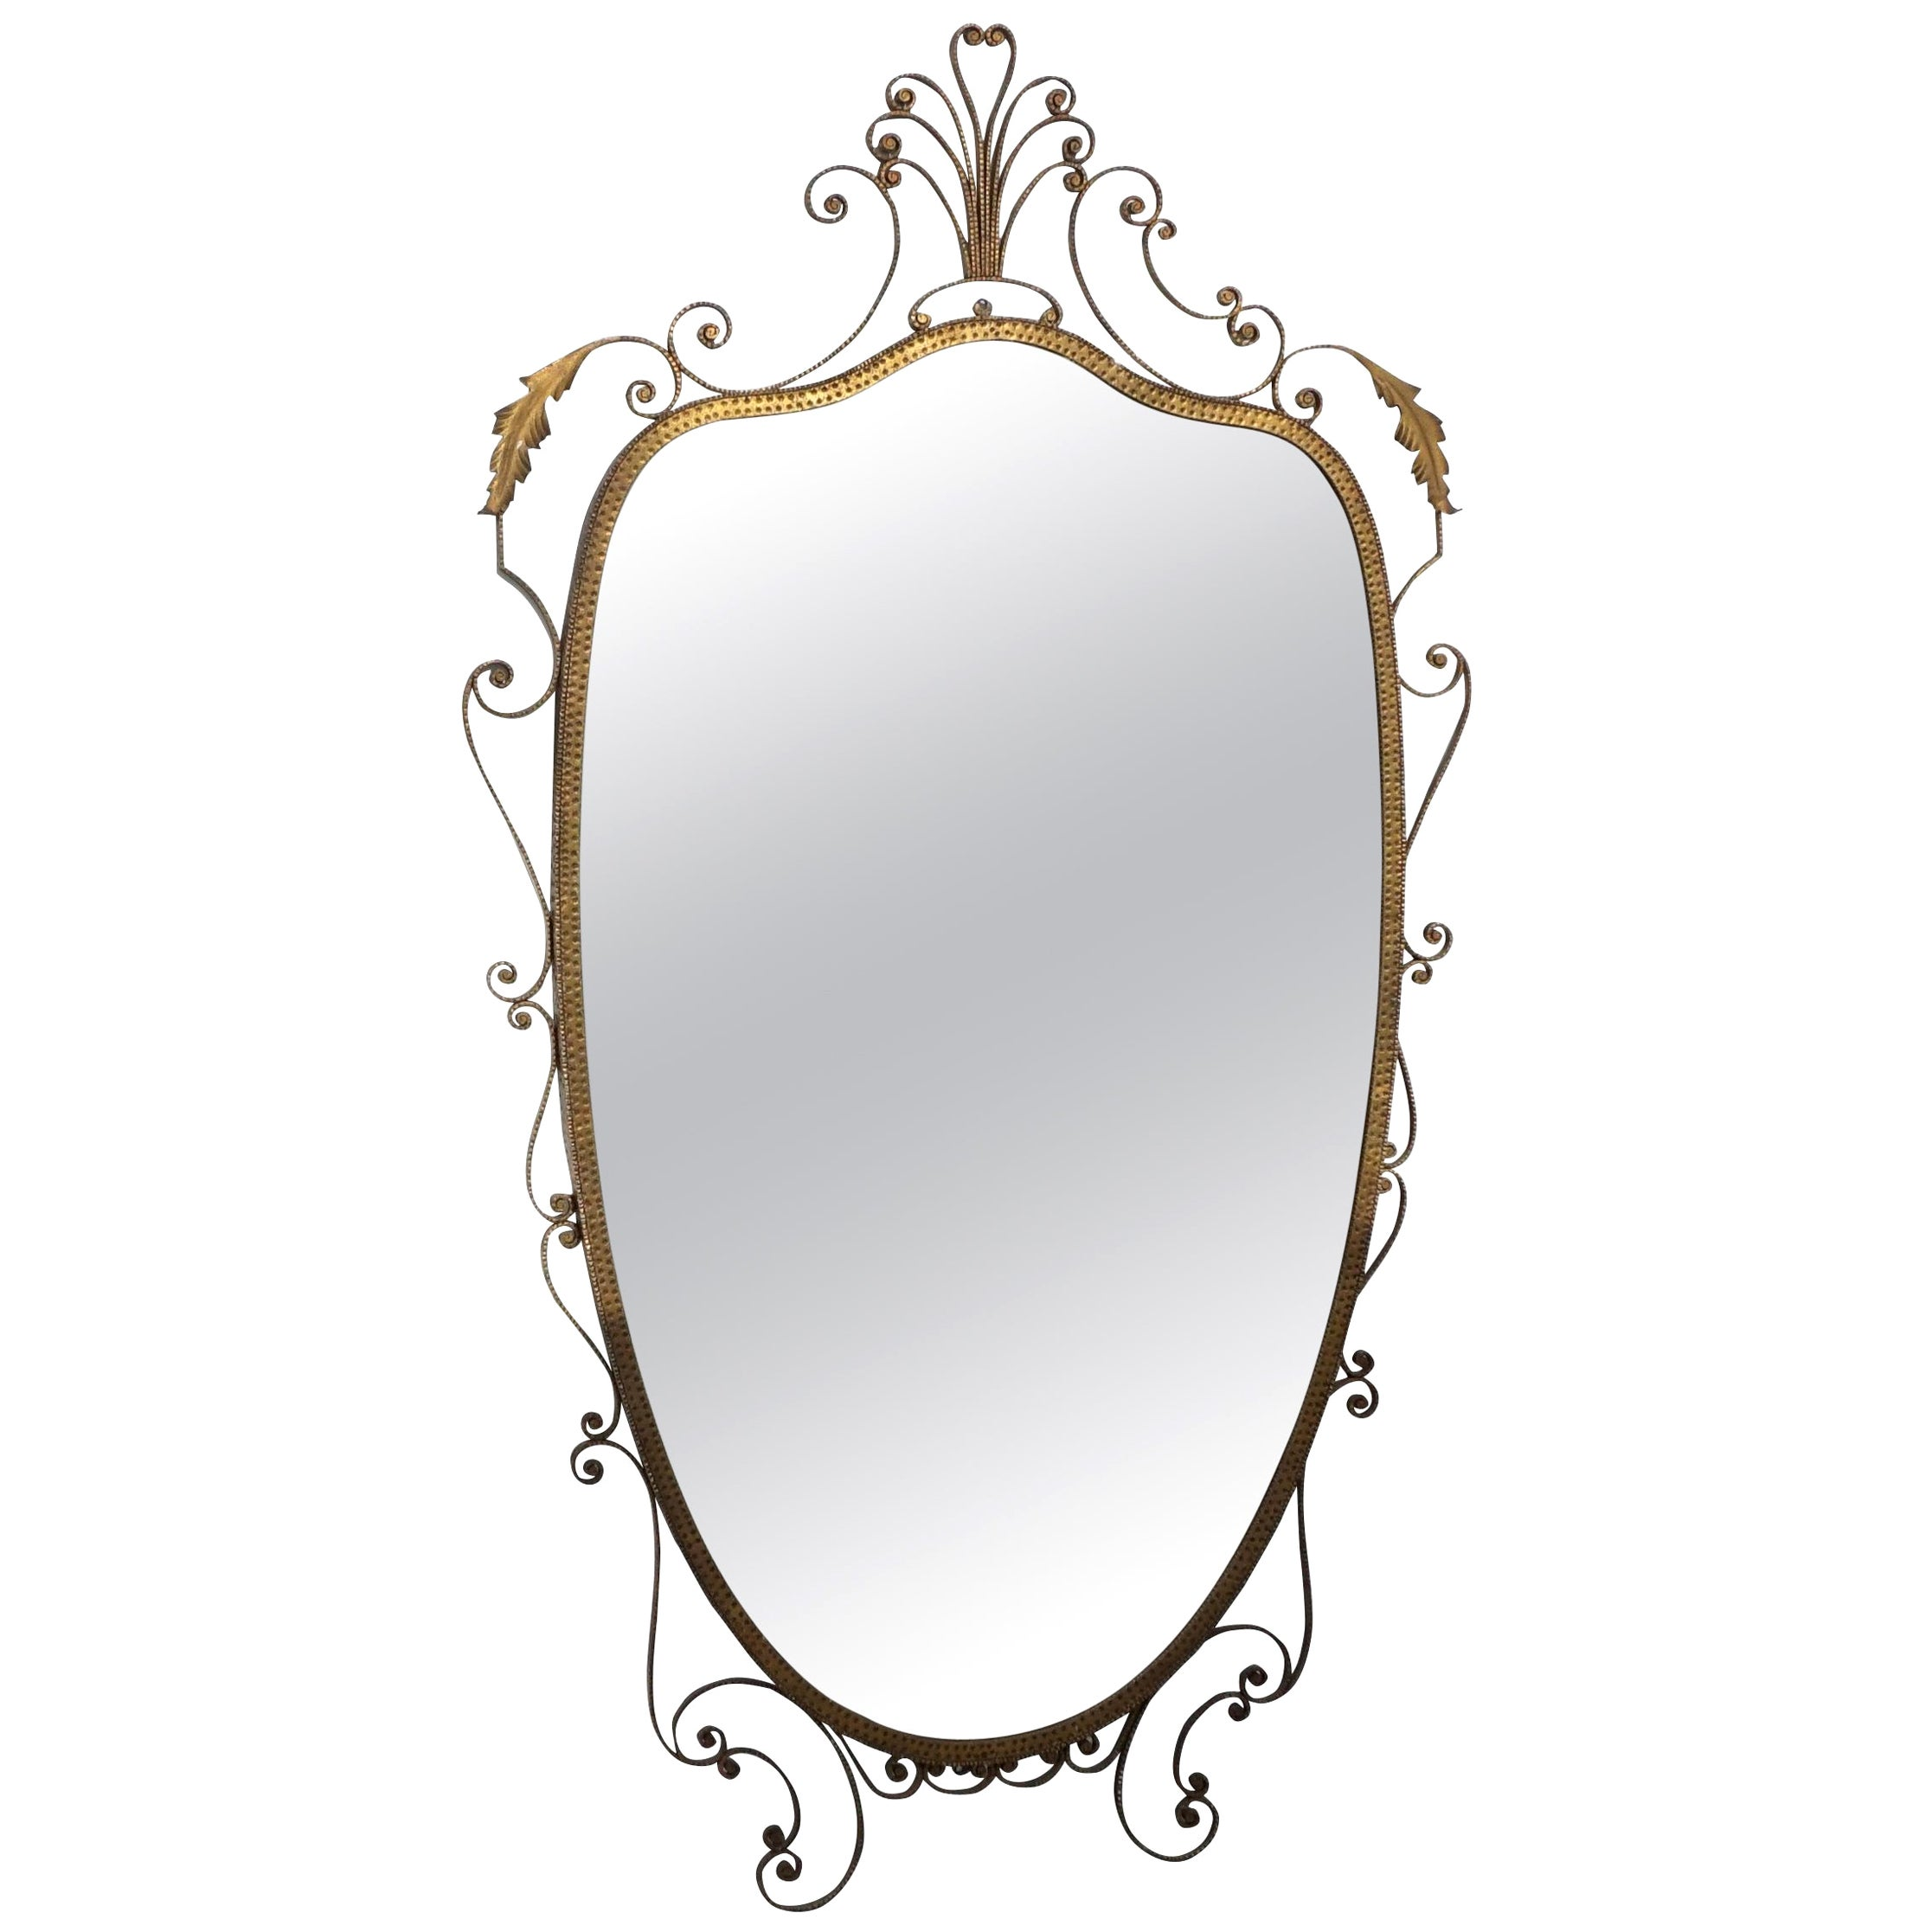 20th Century Italian Gold Metal Oval Wall Mirror